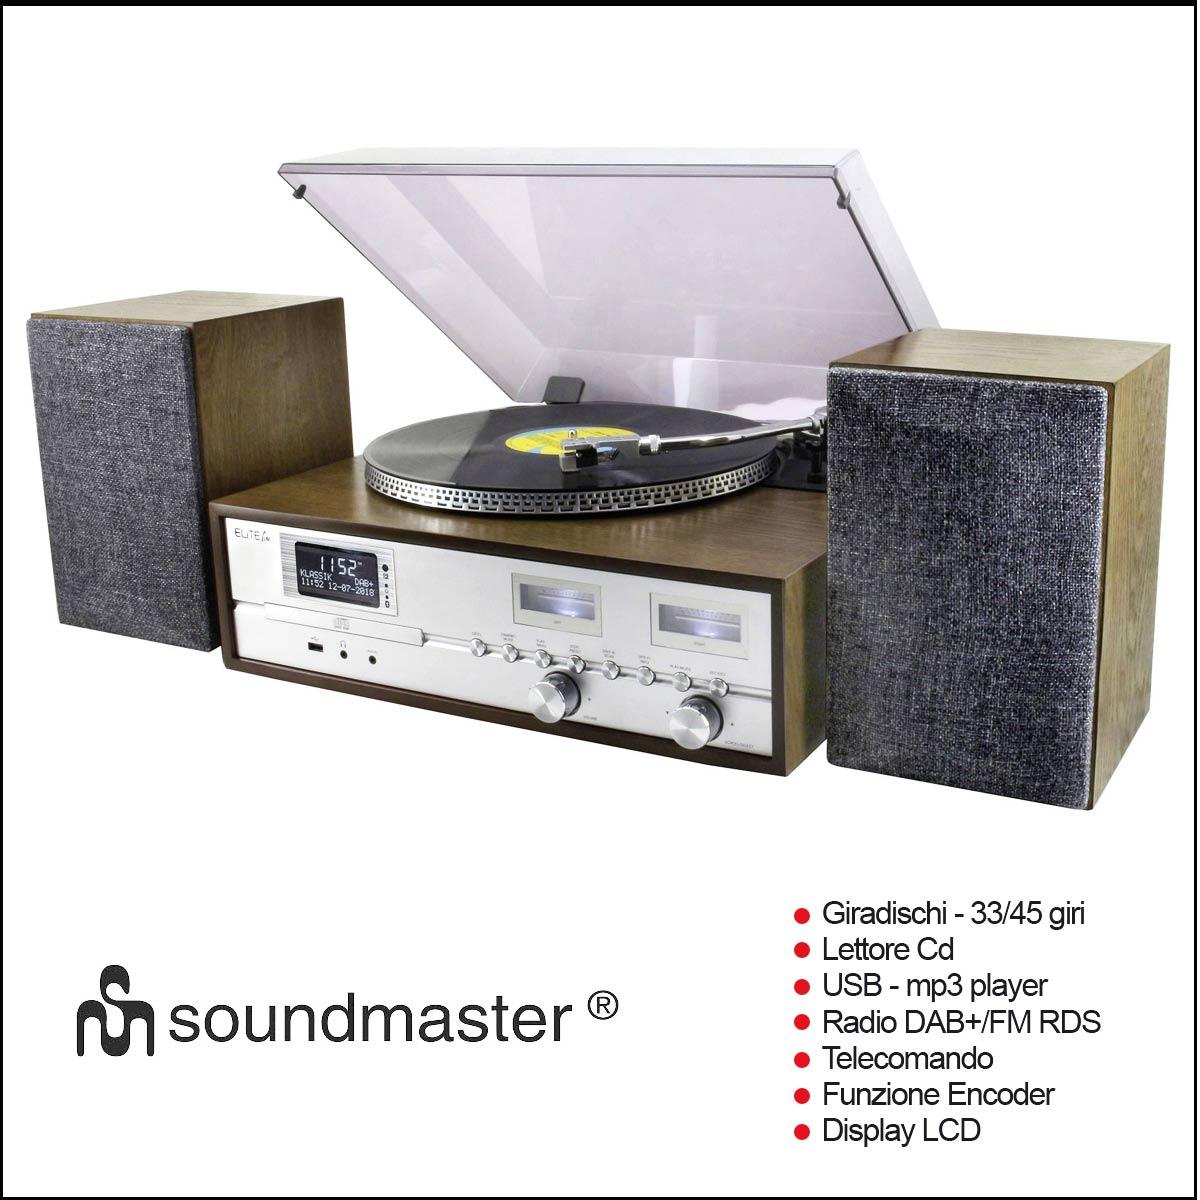 Giradischi Soundmaster pl880 a multifunzione